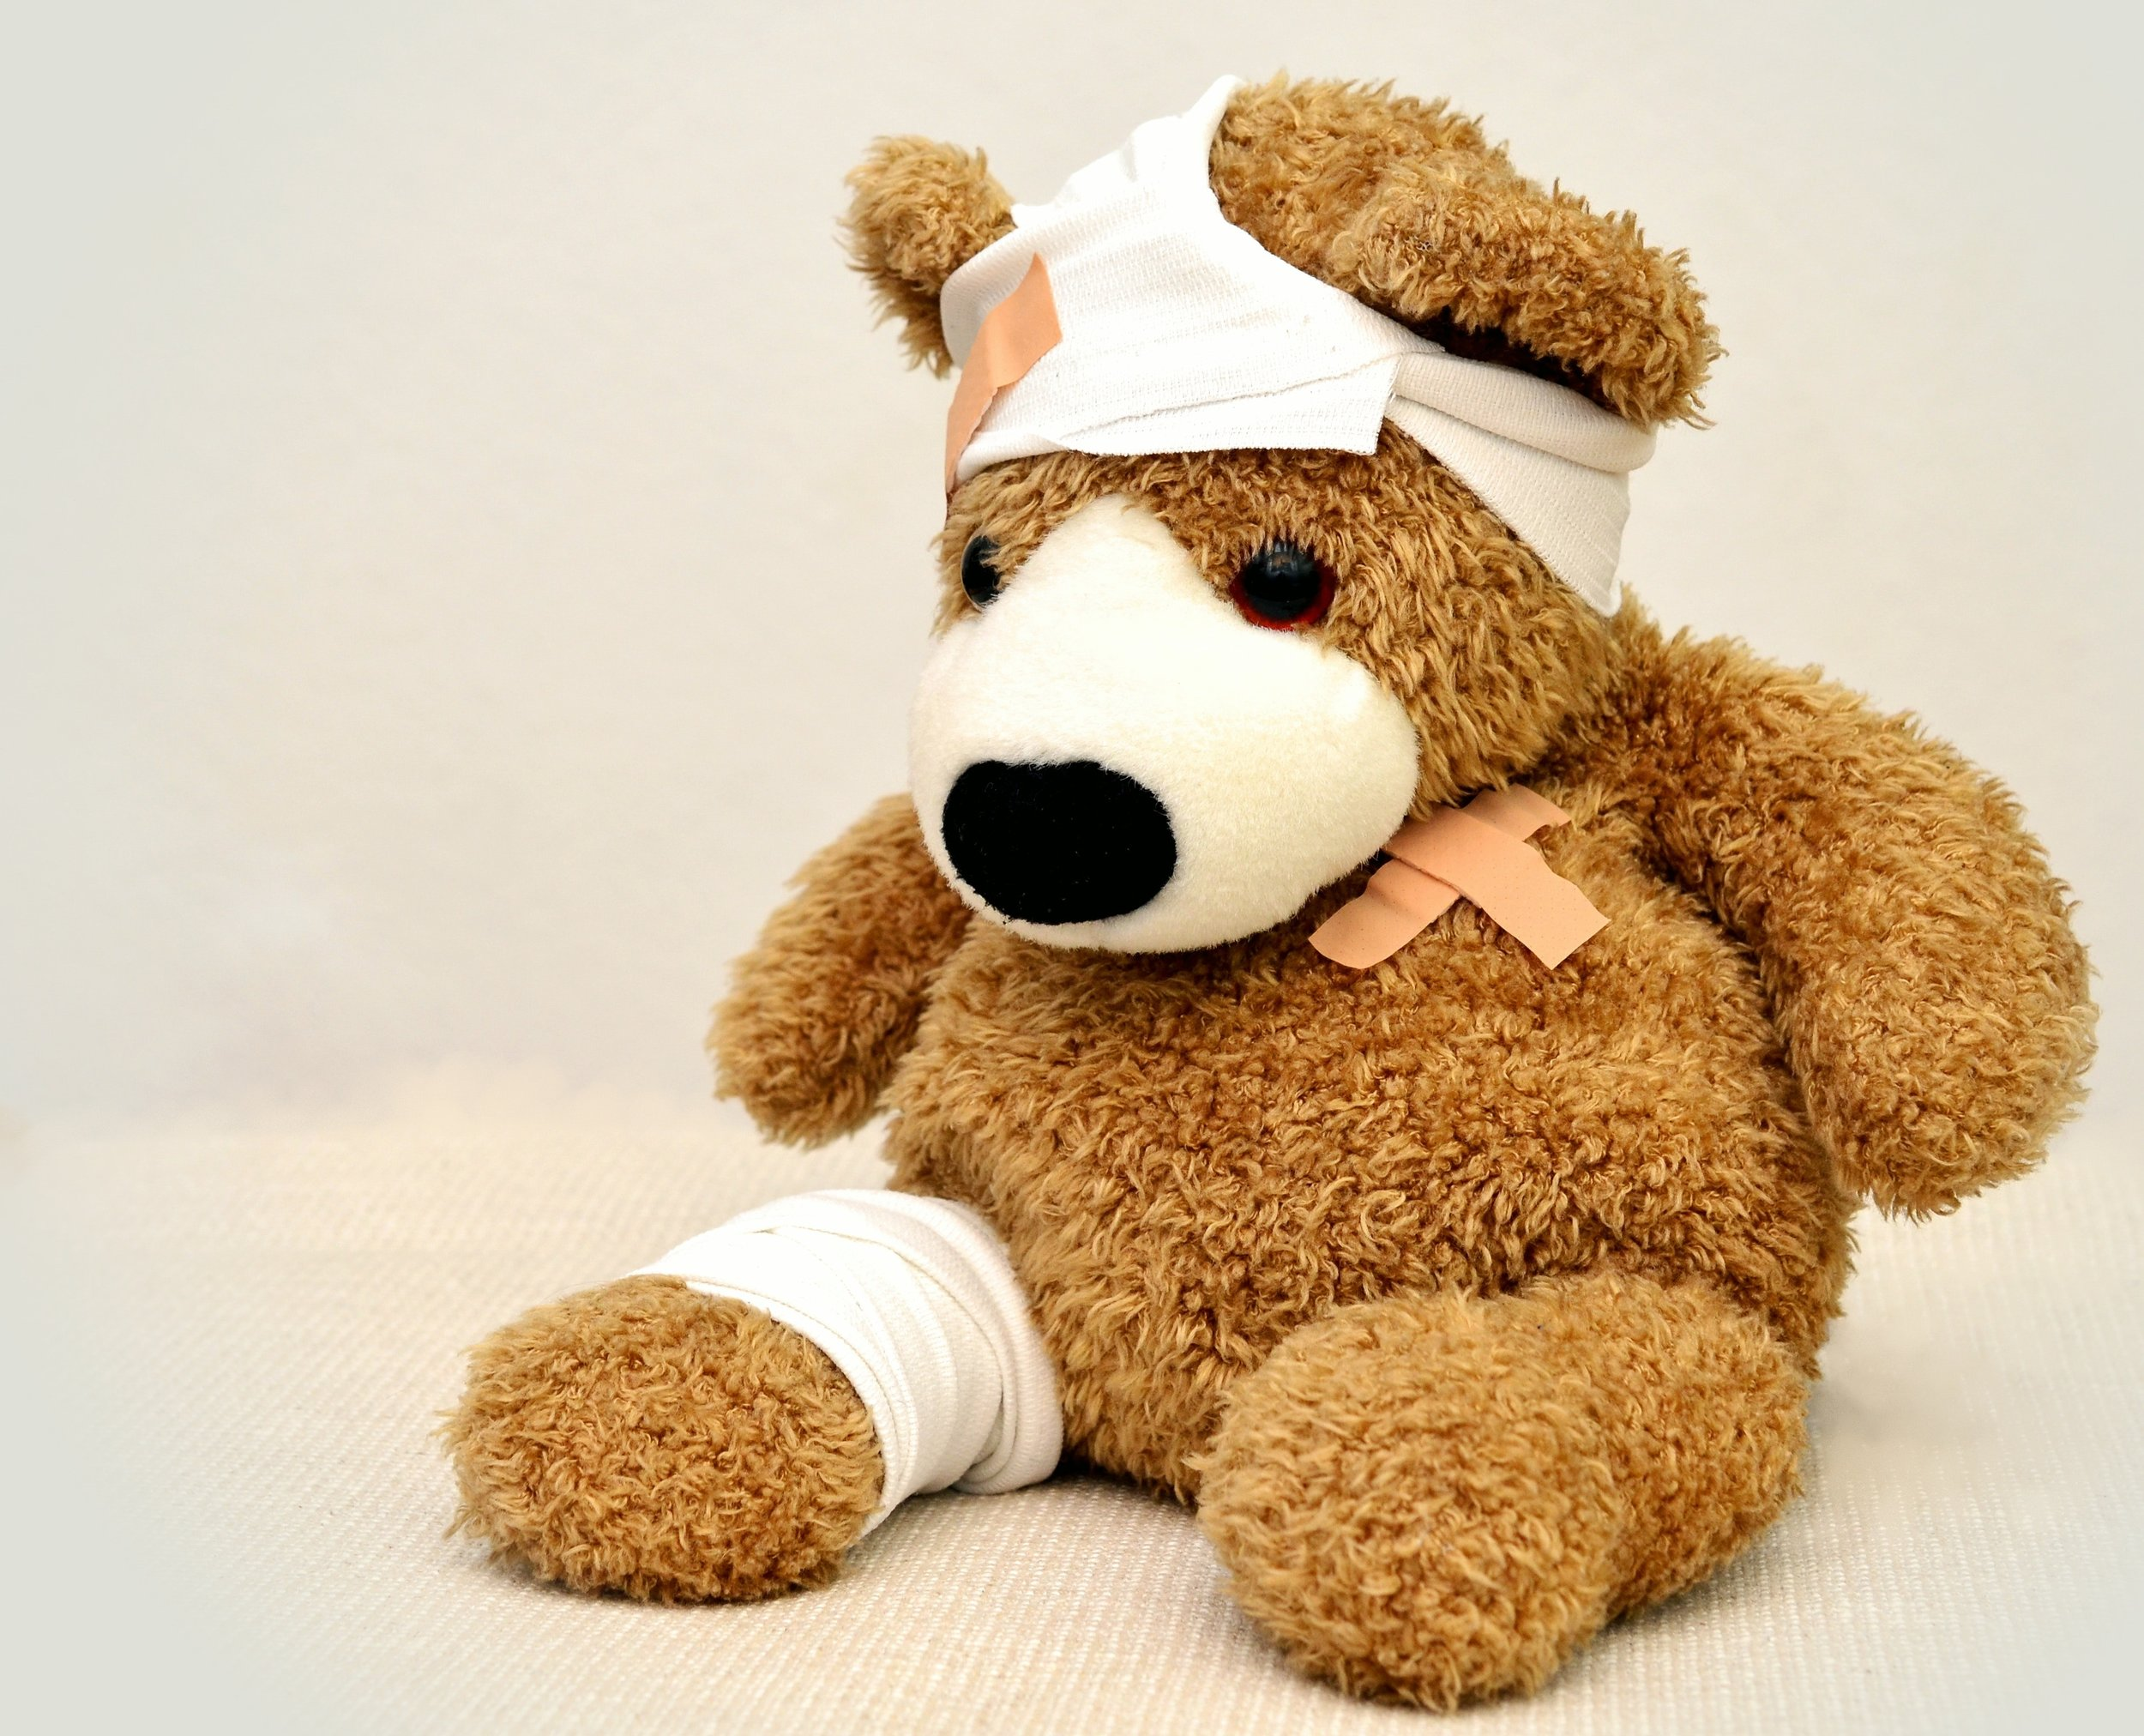 band-aid-bandages-hurt-42230.jpg